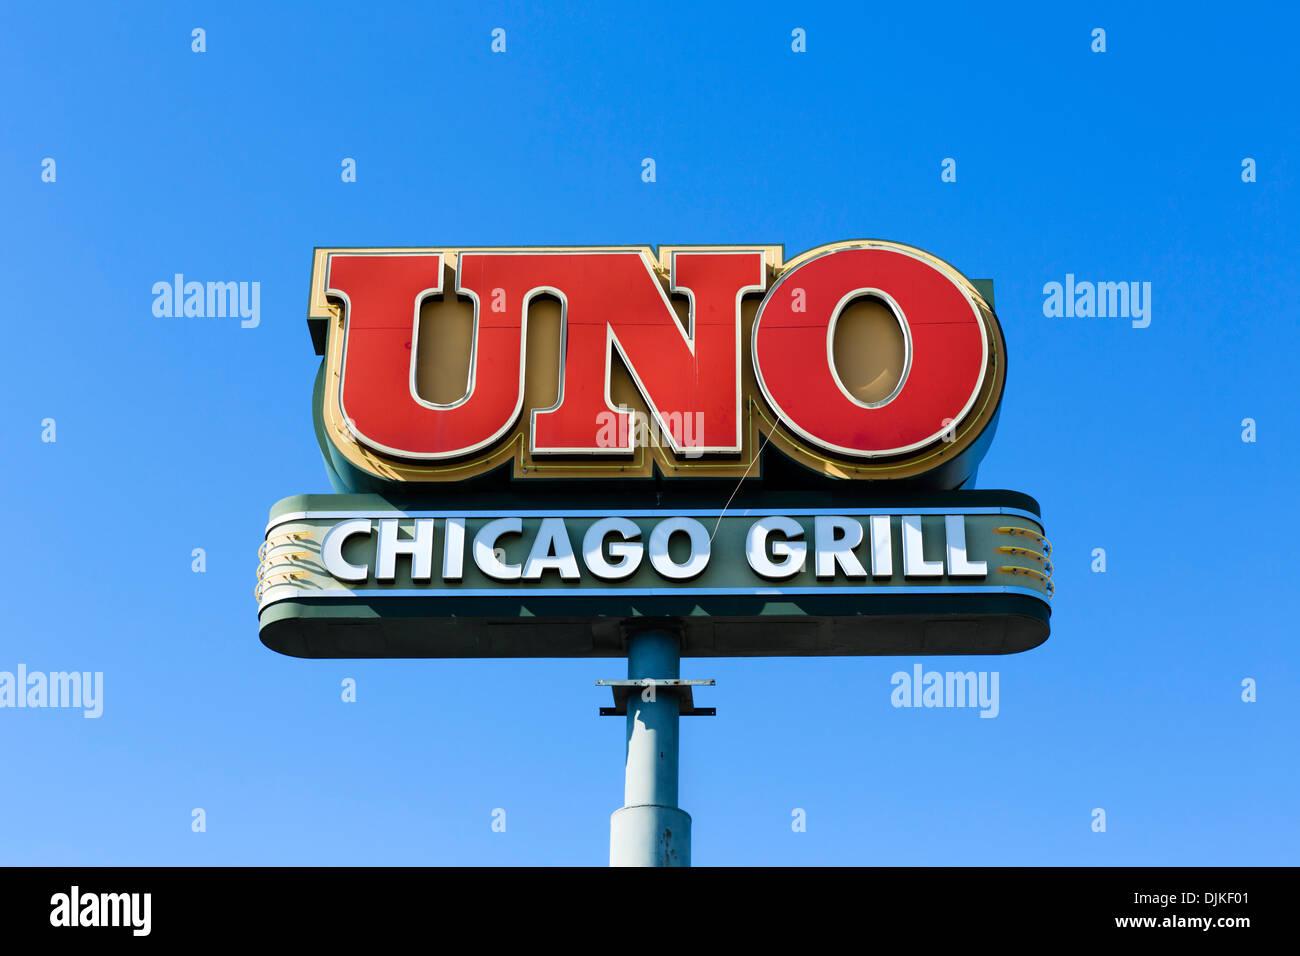 Uno Chicago grill restaurant sign, Central Florida, USA Photo Stock